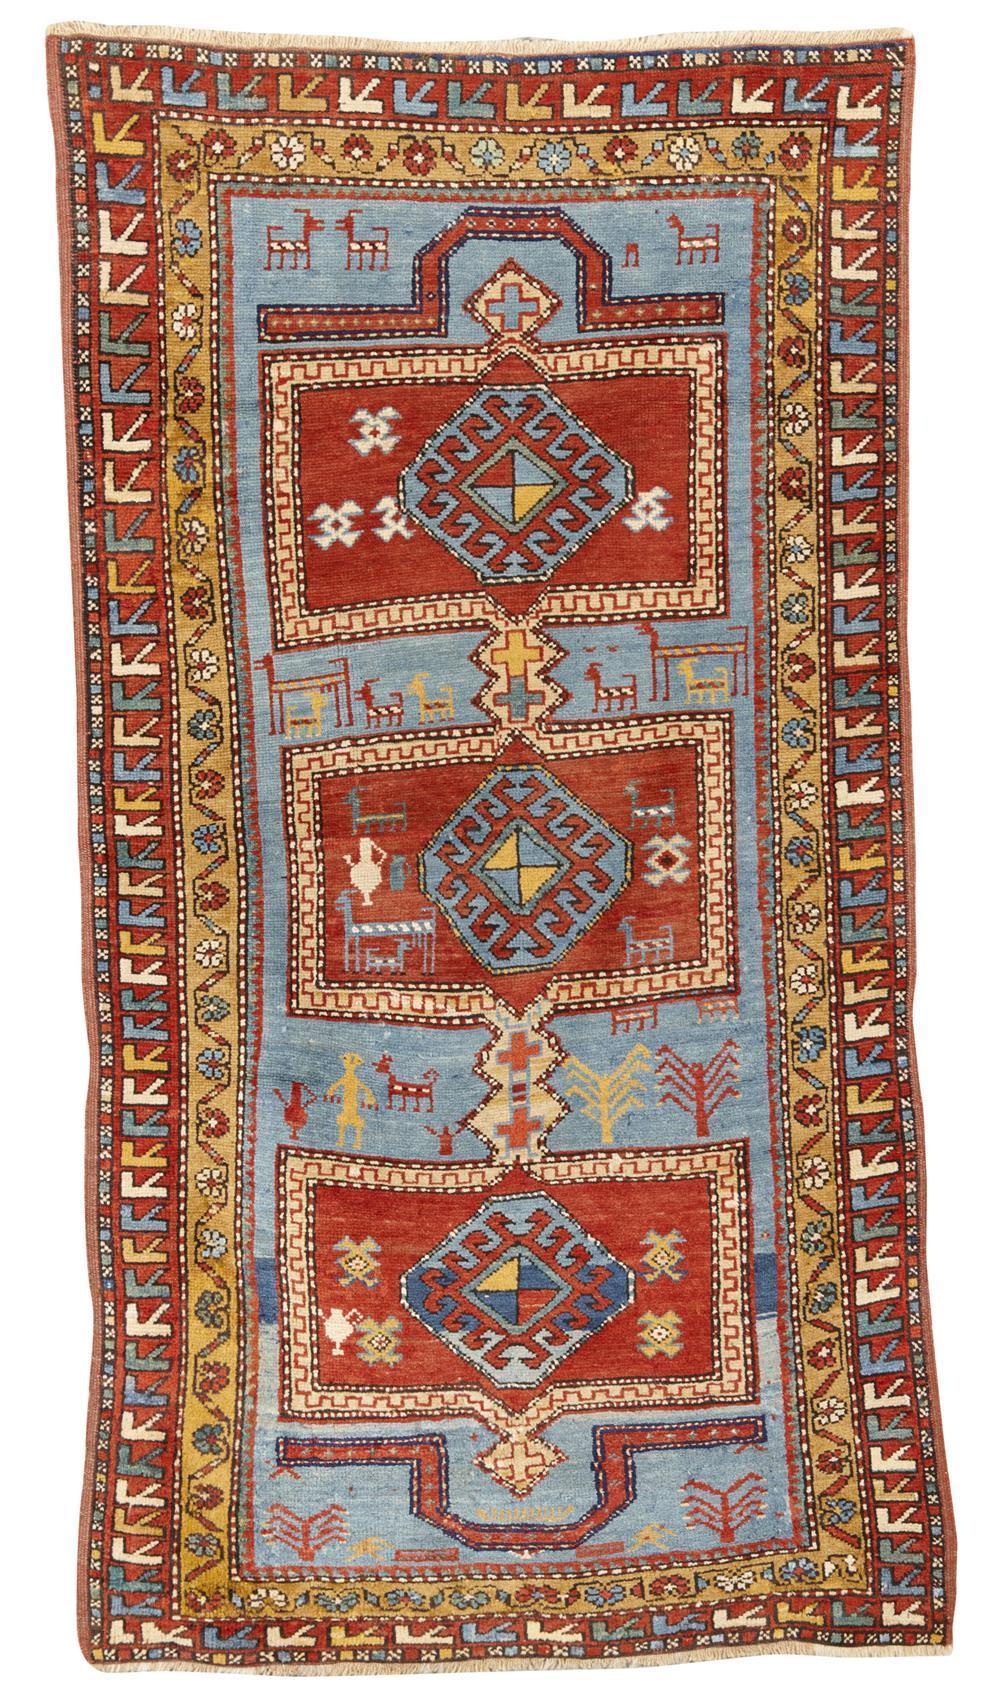 Kazak Double Niche Prayer Rug, Caucasus, ca. 1910; 6 ft. 7 in. x 3 ft. 4 in.